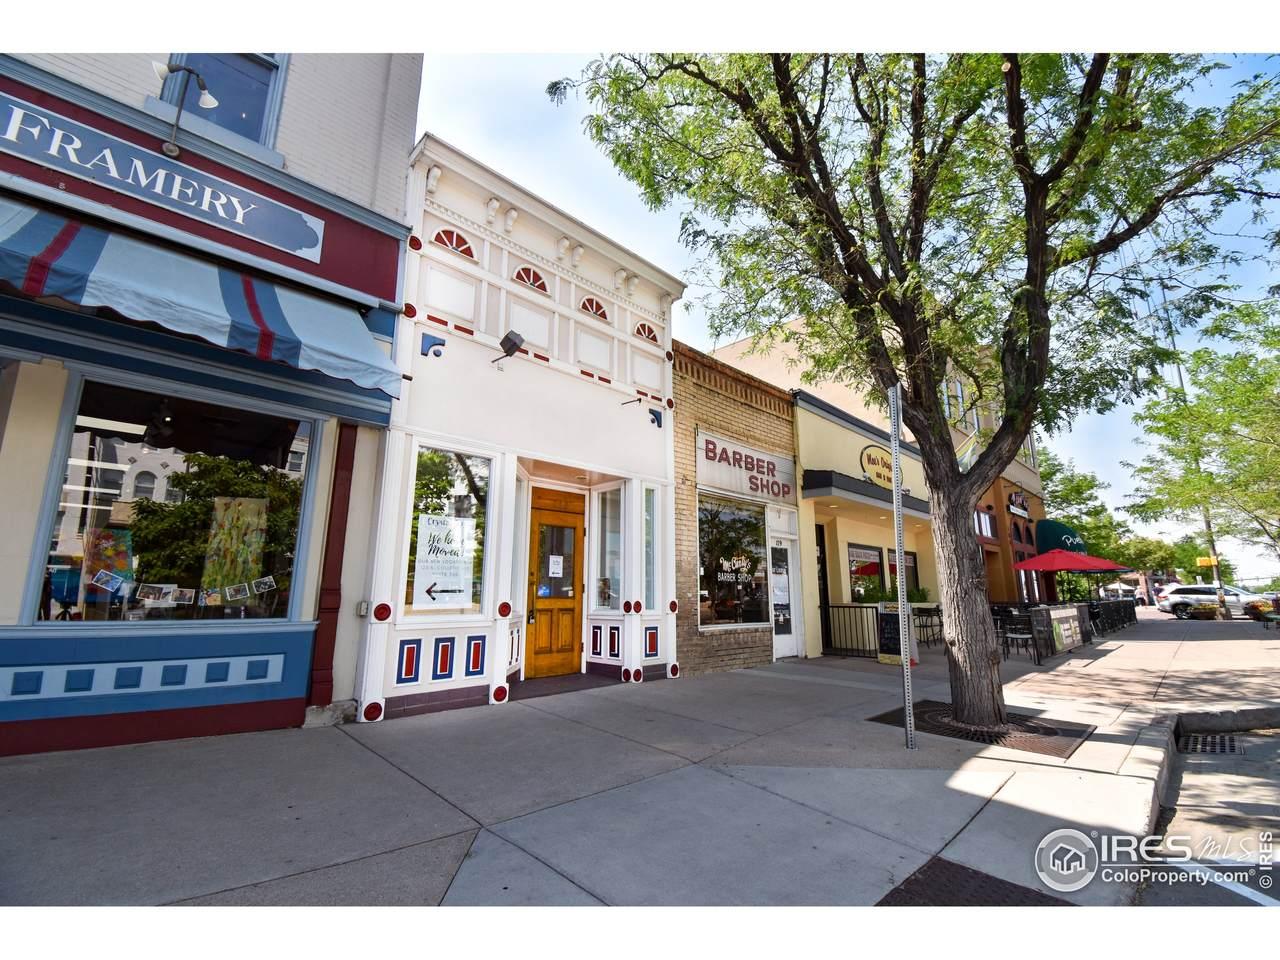 177 College Ave - Photo 1